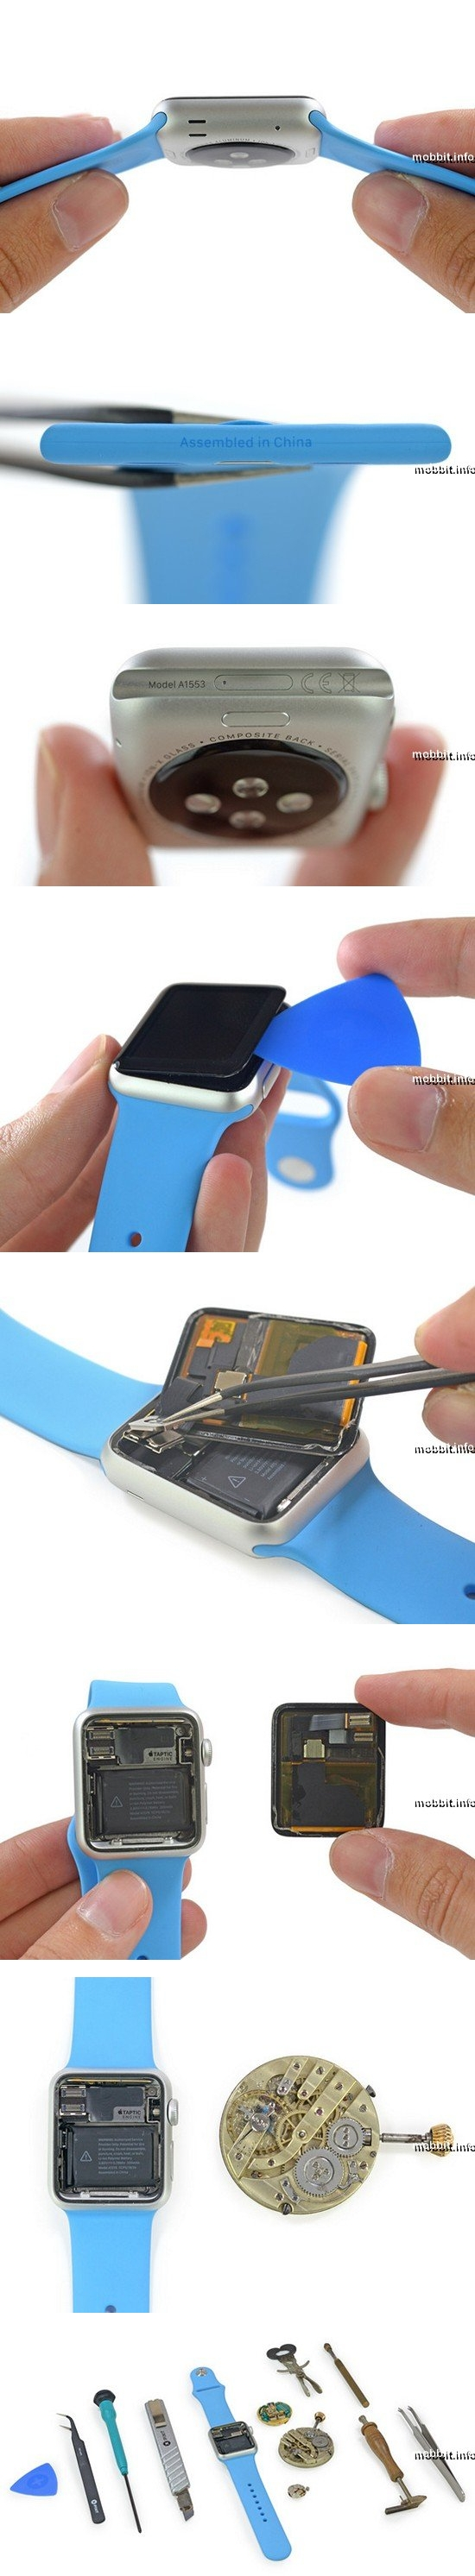 Apple Watch разобраны в лаборатории iFixit